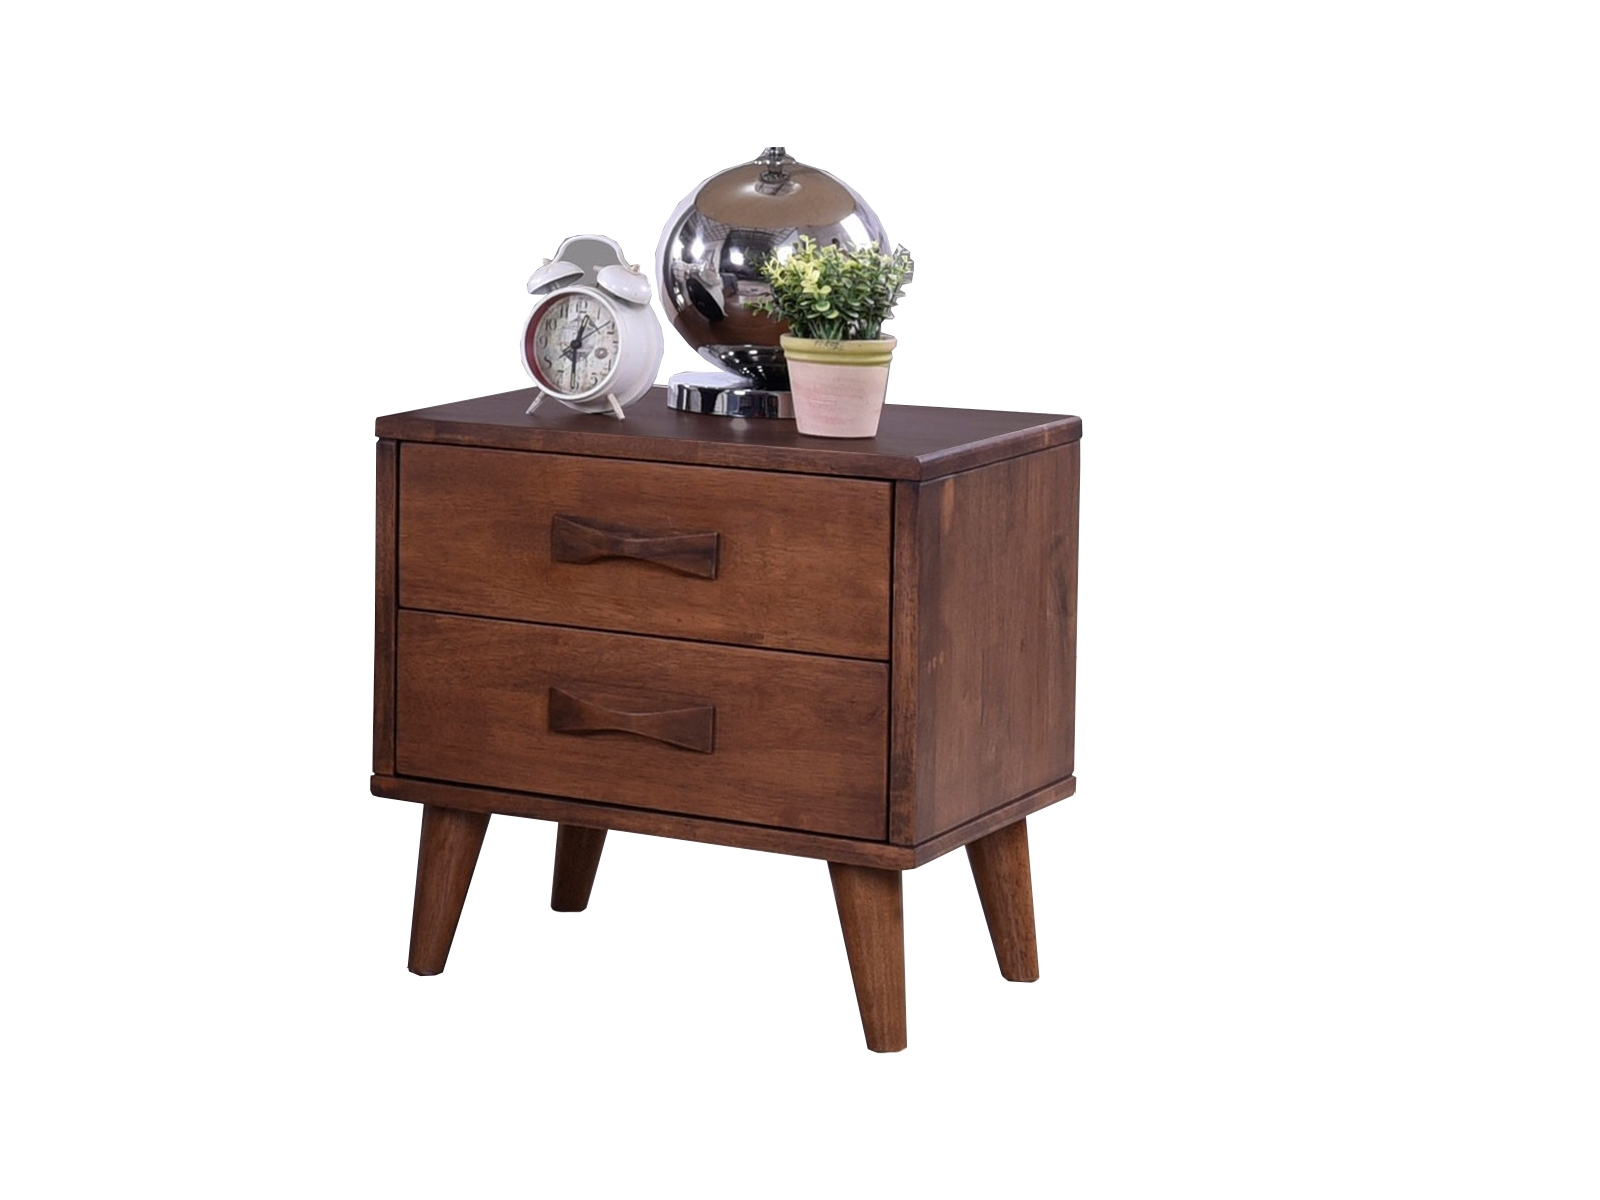 Noptiera din lemn cu 2 sertare Emily Walnut, l47xA40xH50 cm imagine